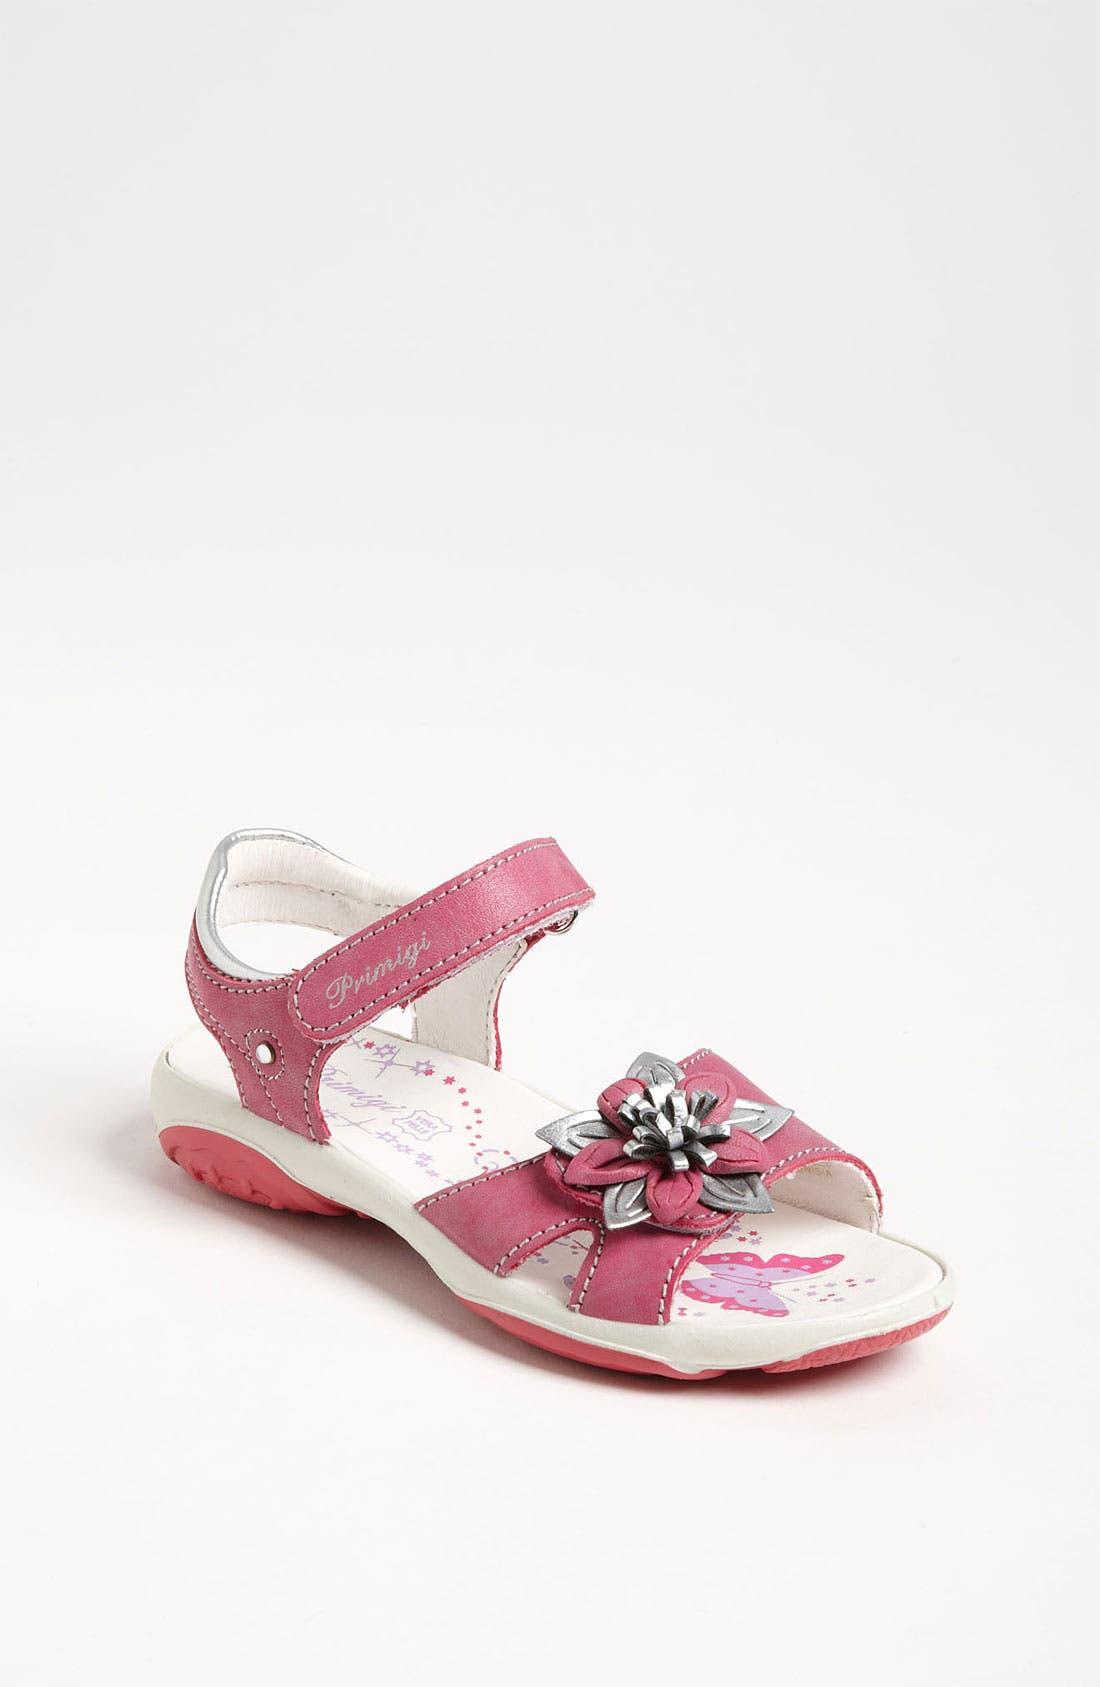 Main Image - Primigi 'Fata' Sandal (Toddler & Little Kid)